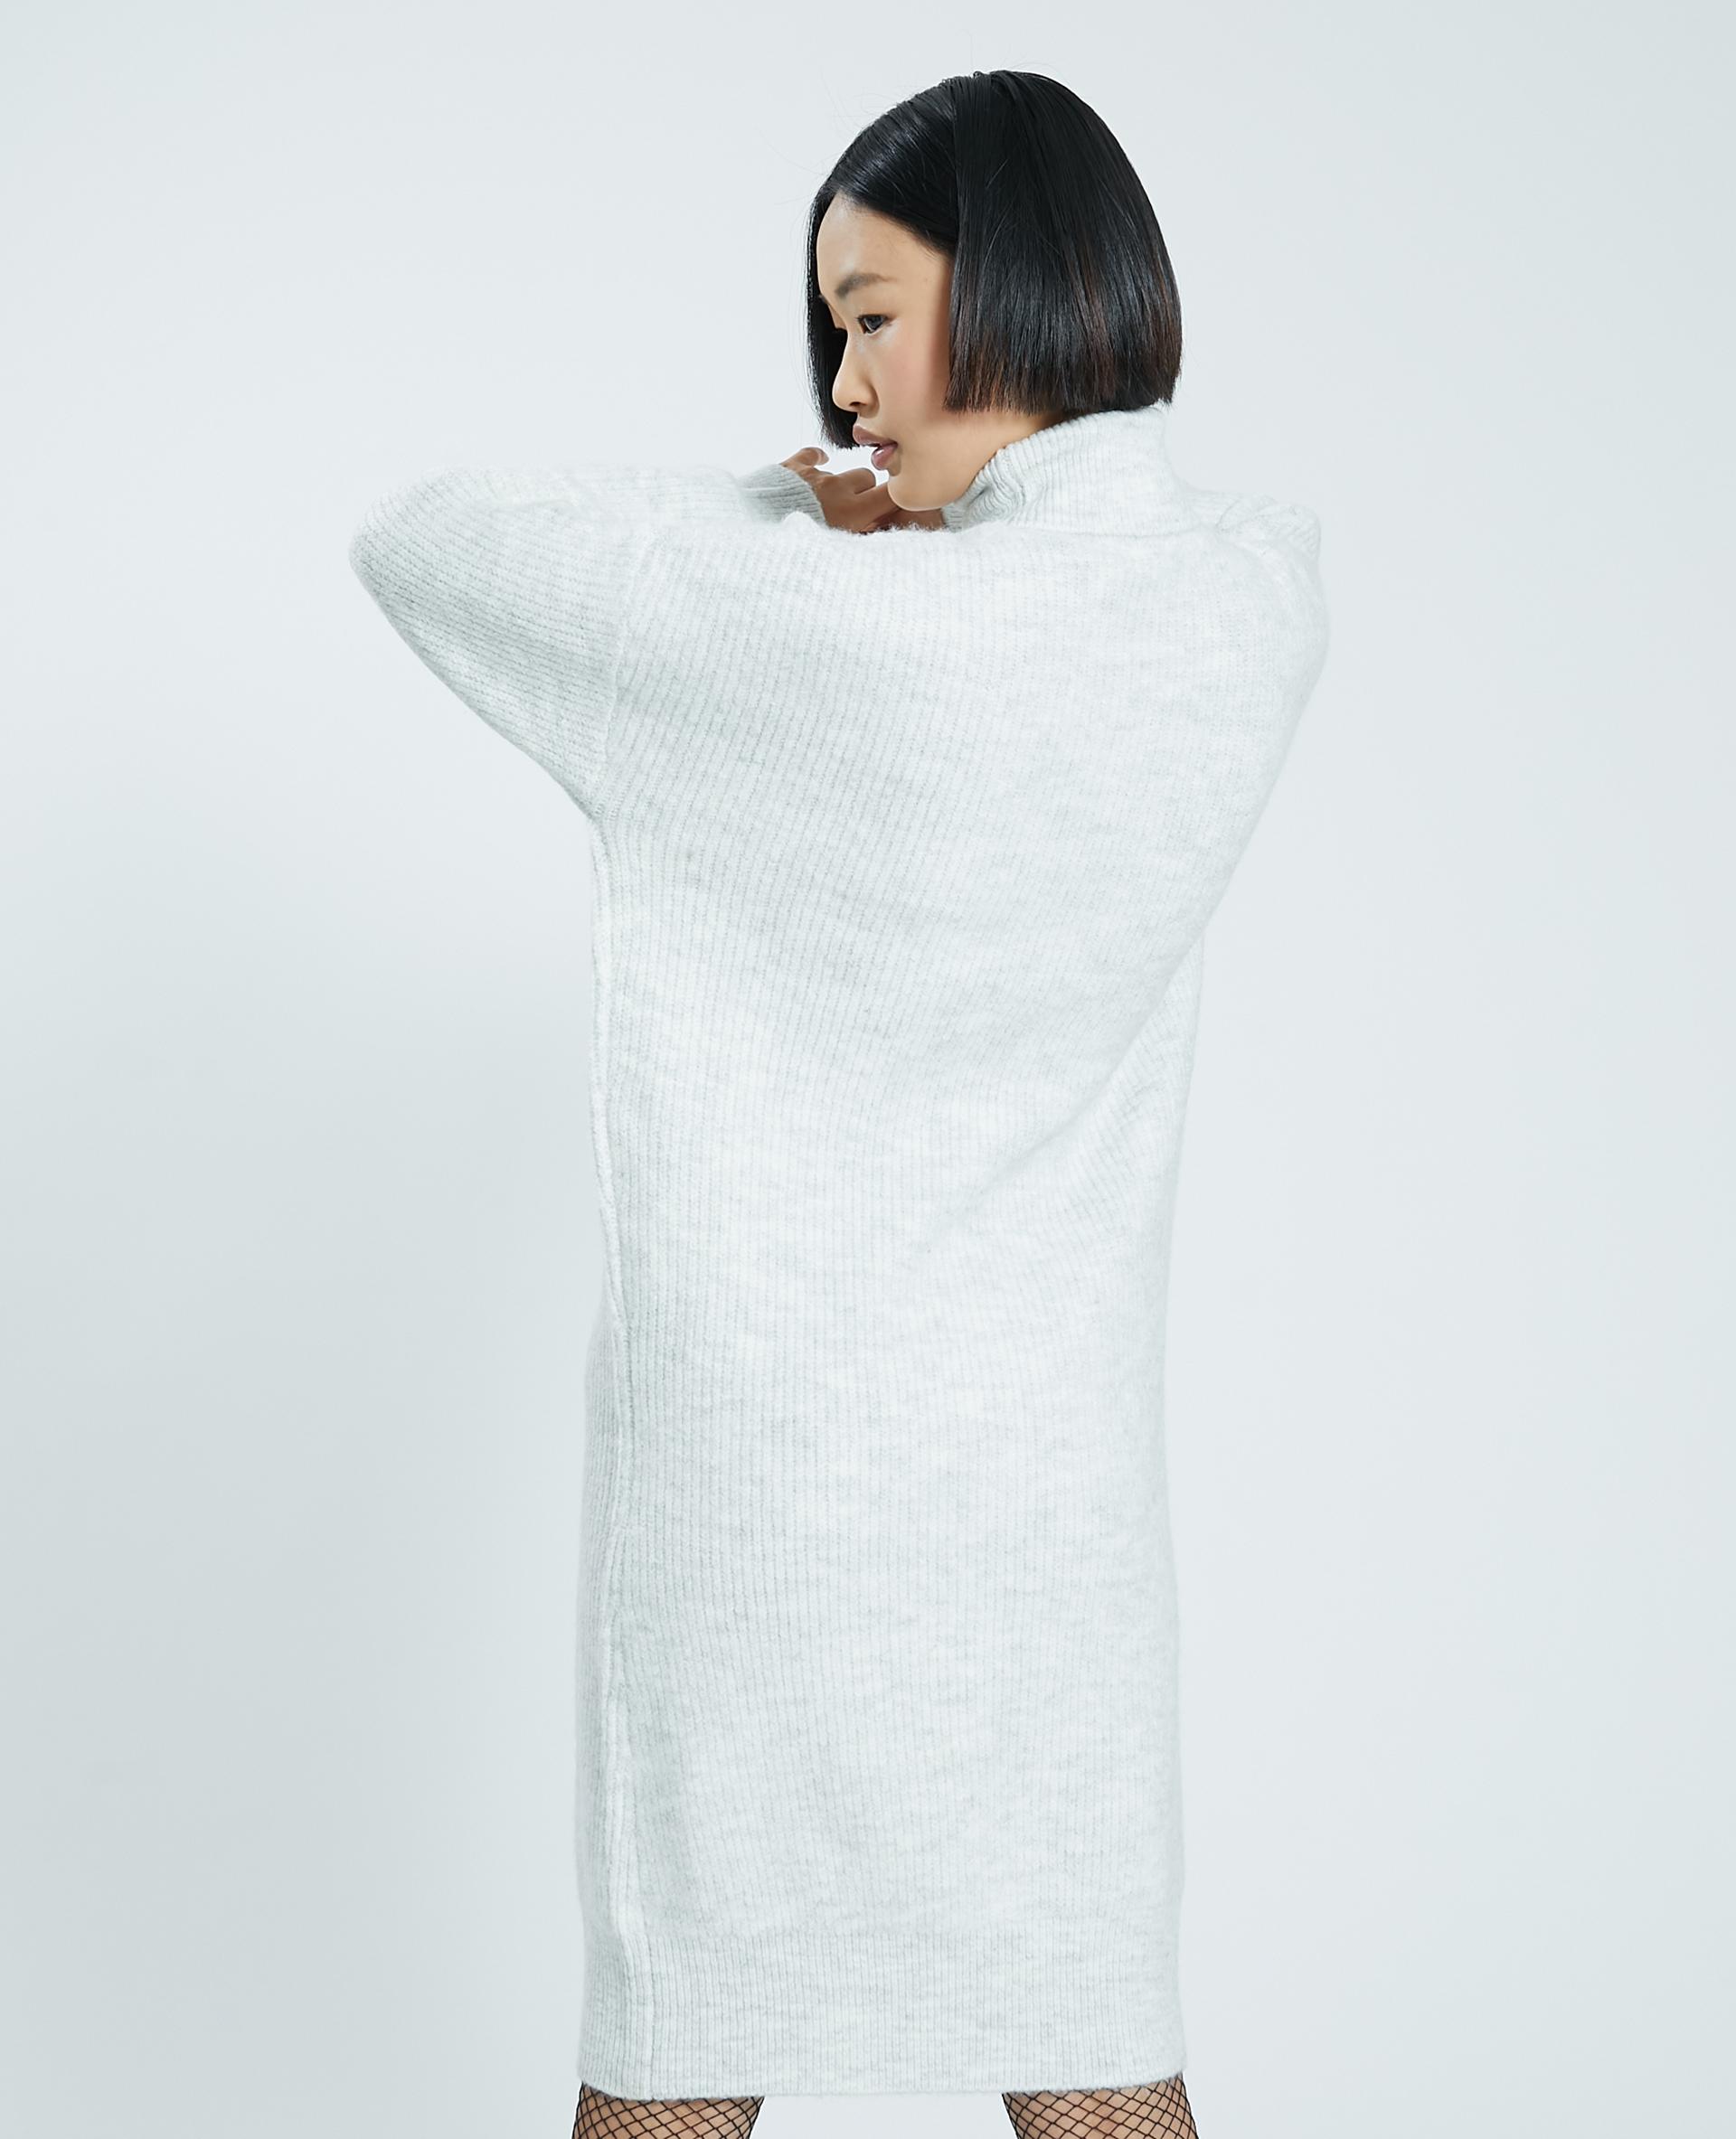 Robe pull col roulé gris clair chiné - Pimkie